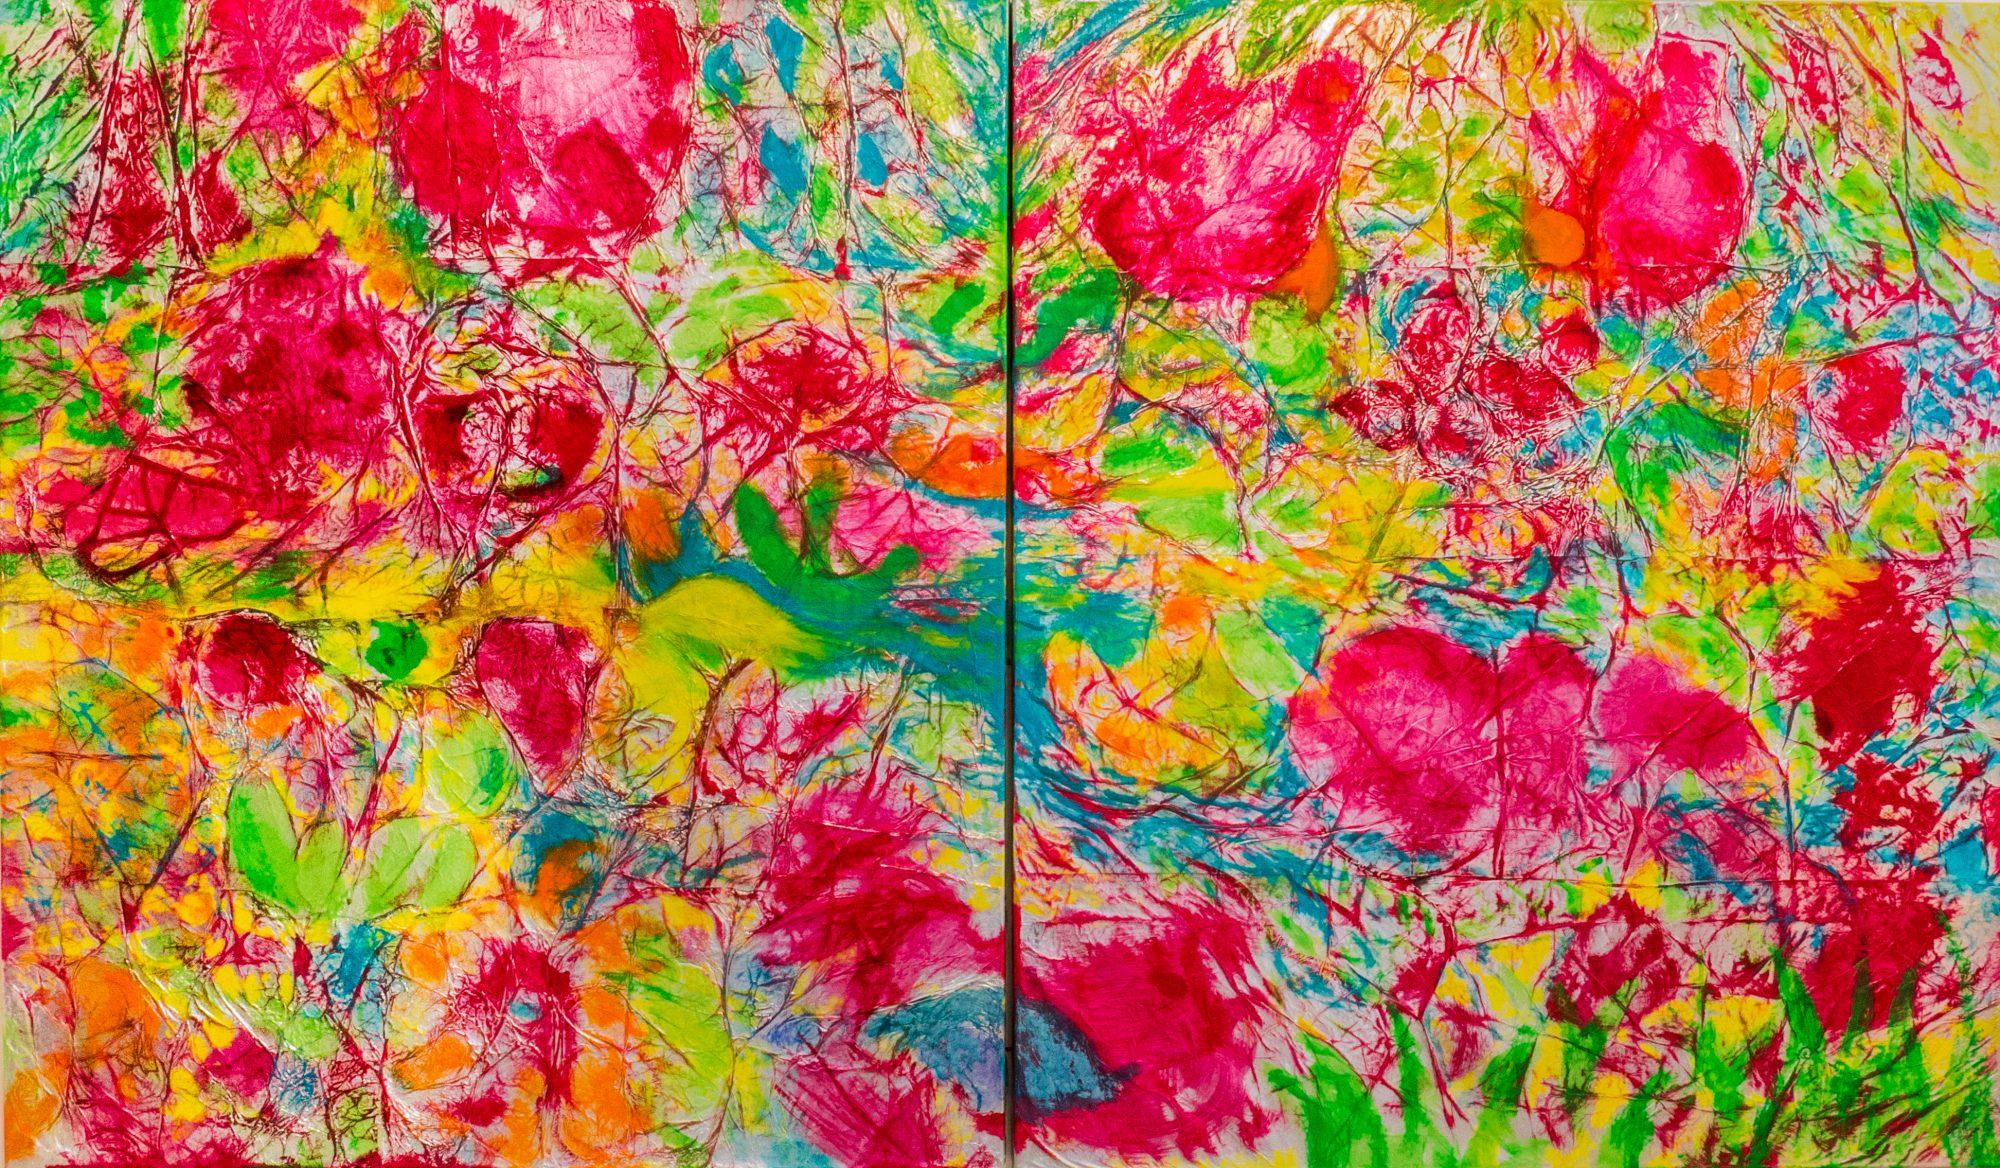 Flowerpower, Acryl auf Aluminium, 140 x 120 cm, 2019